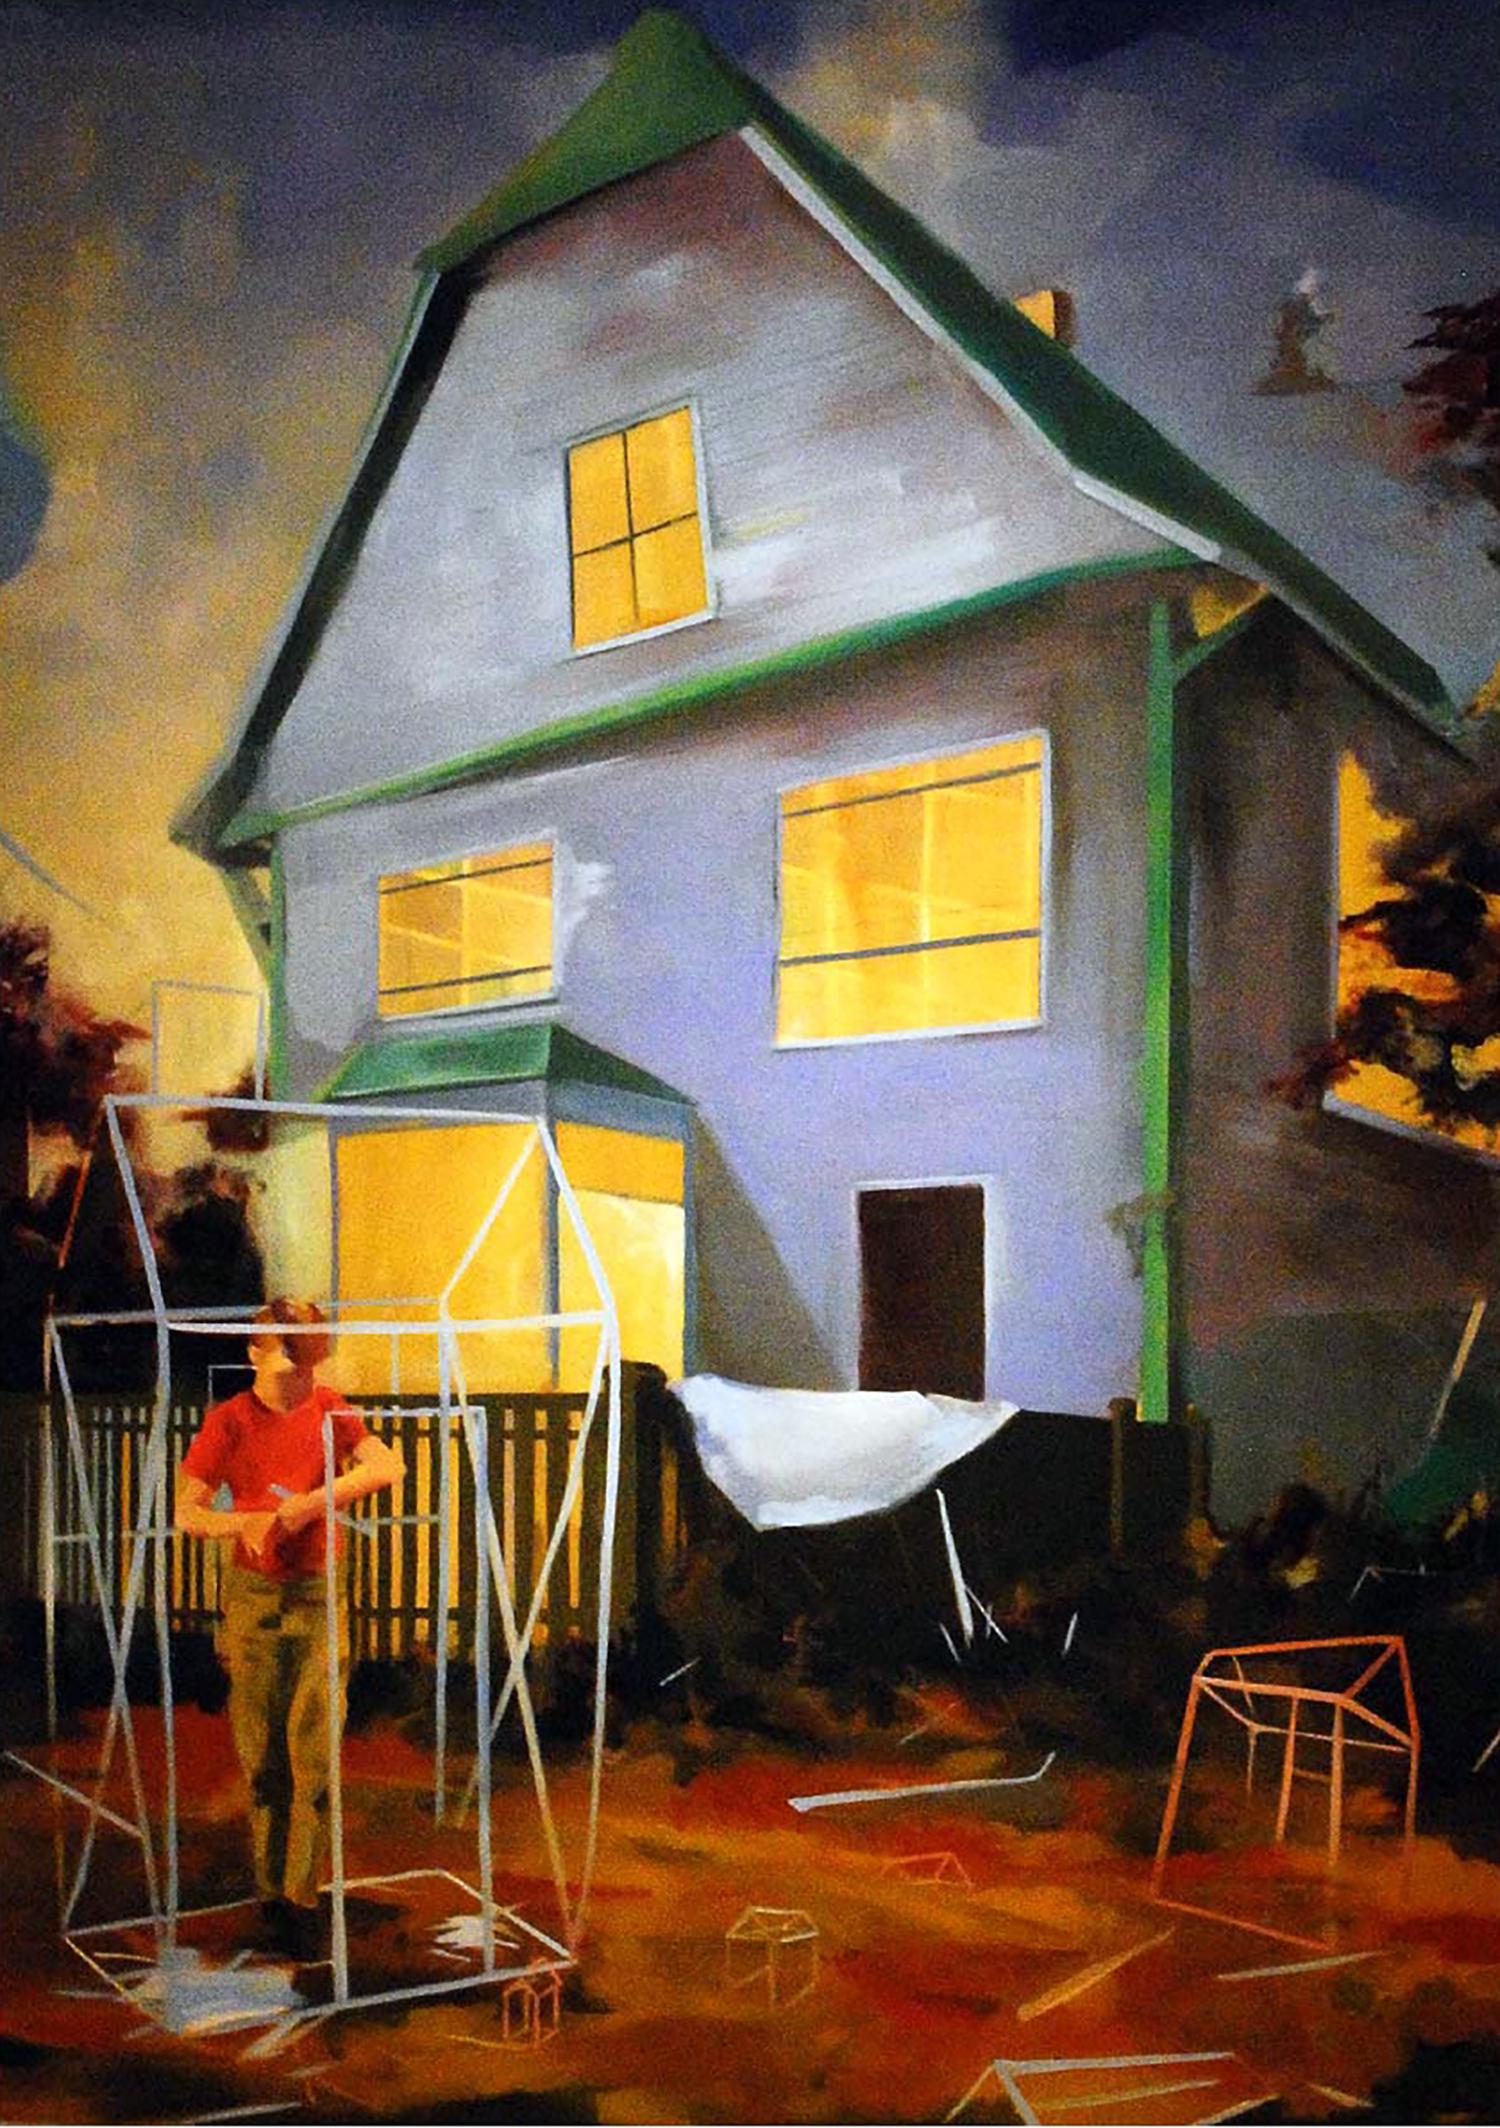 Folded Houses